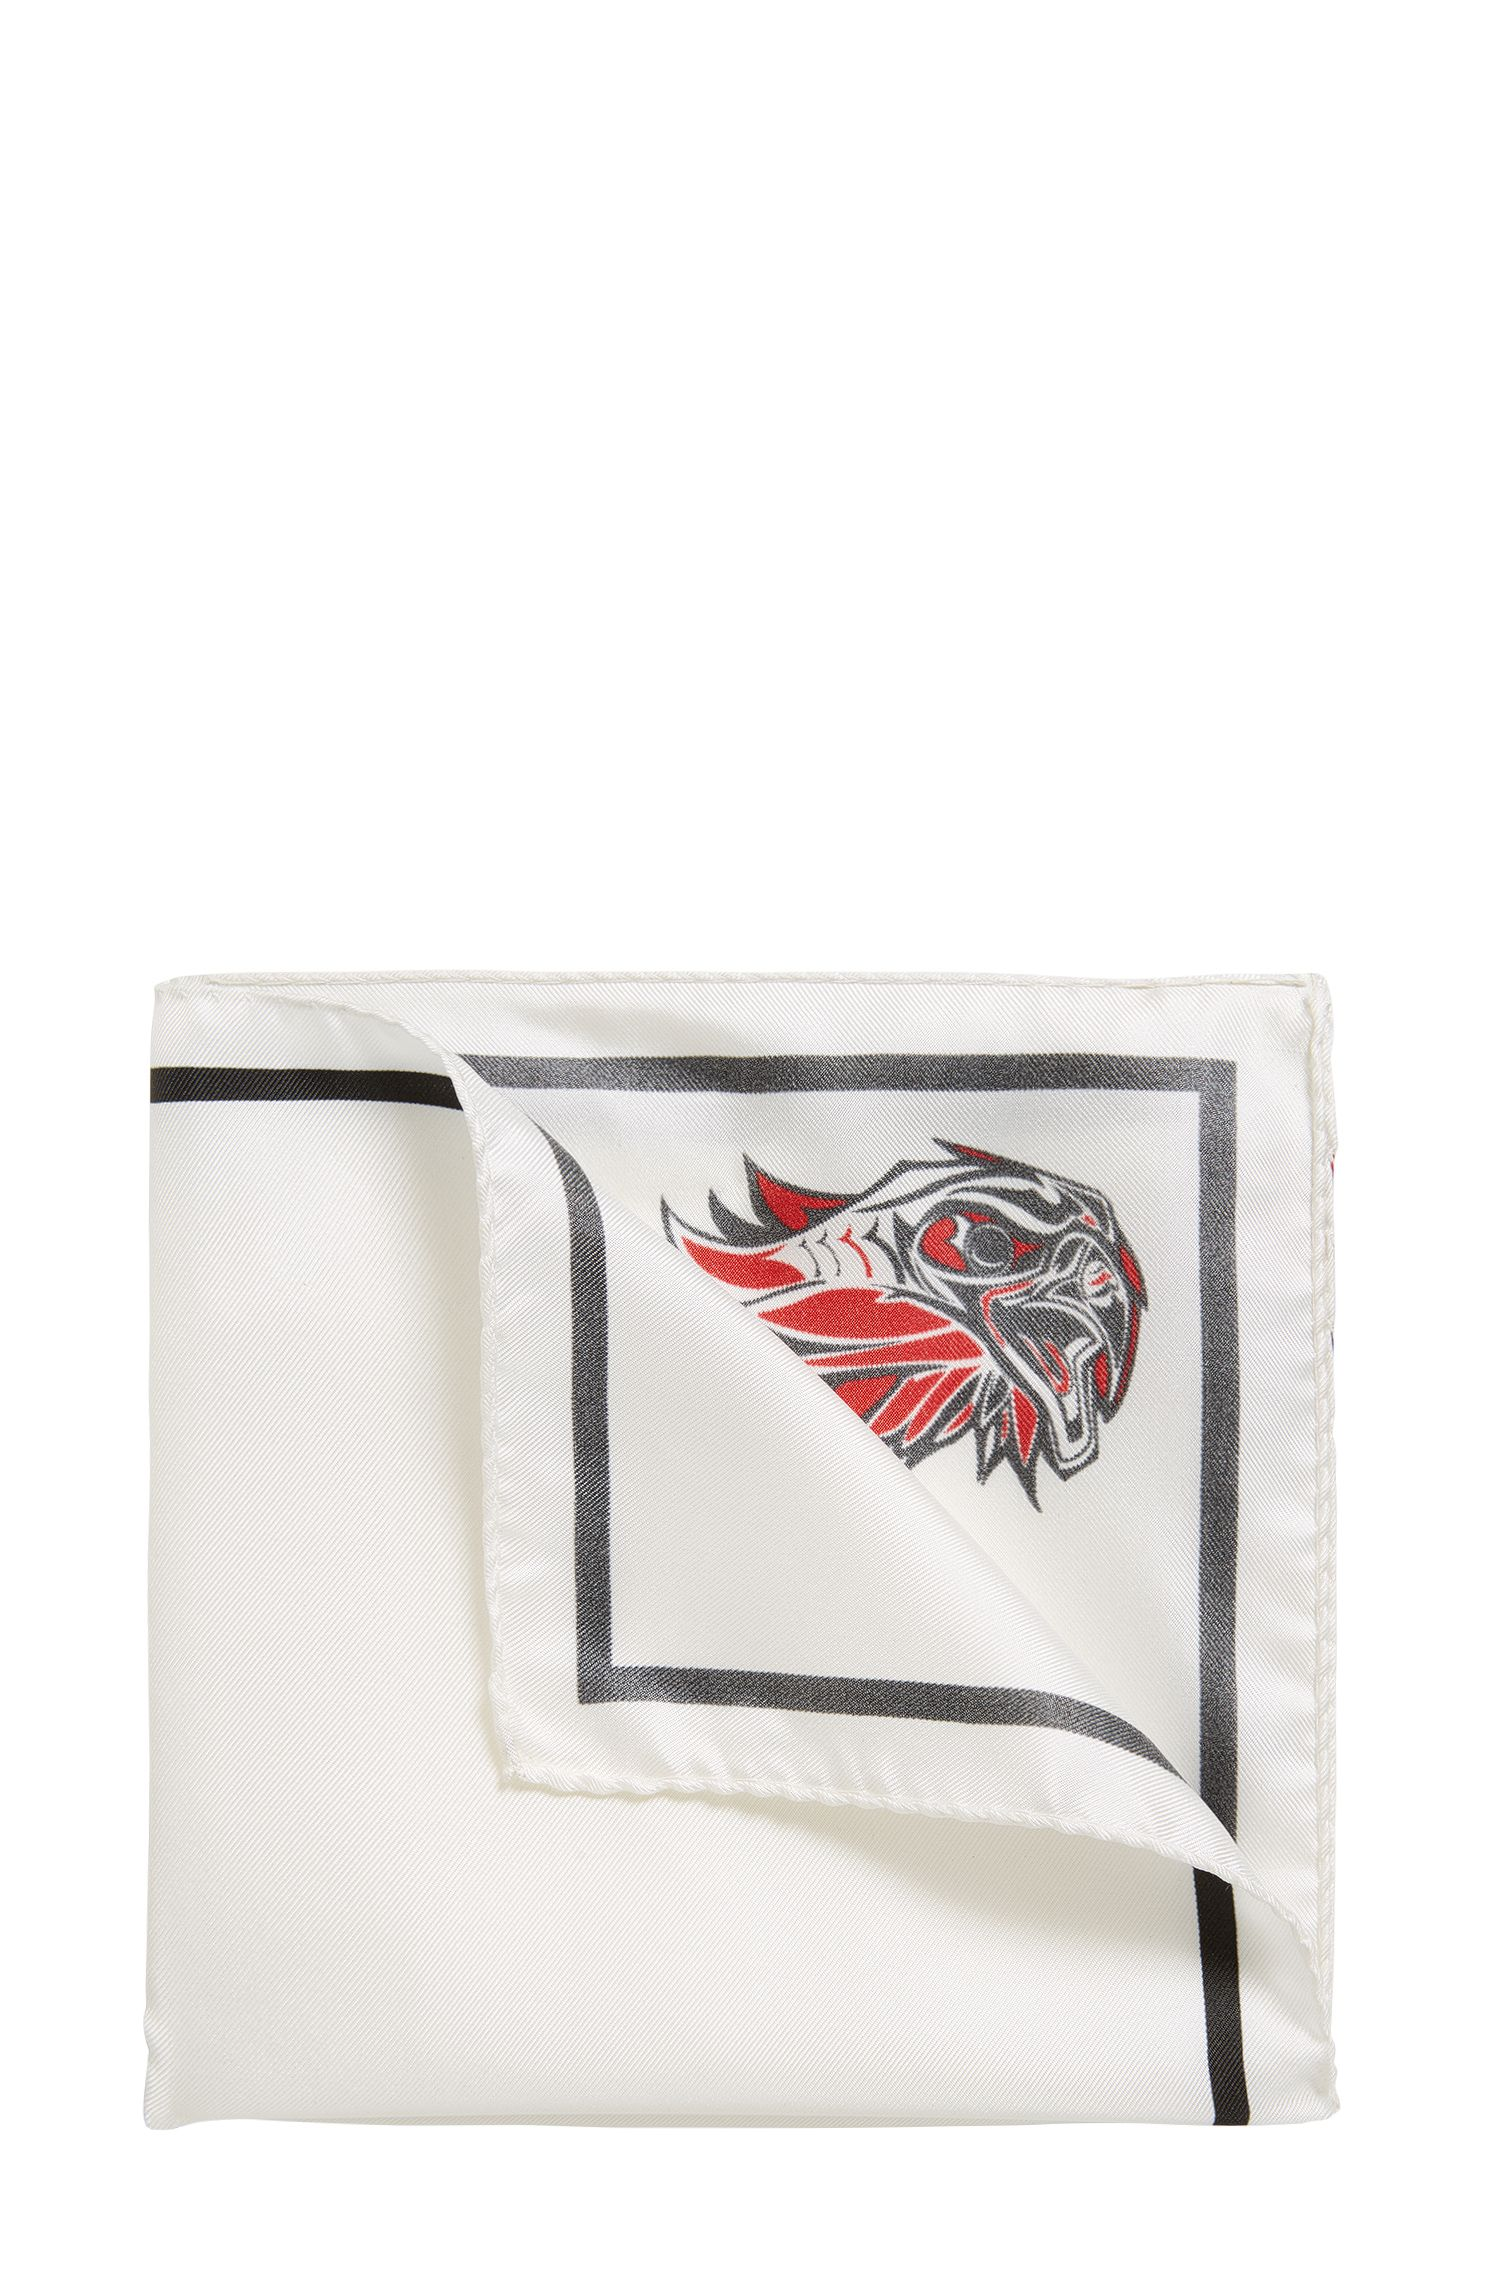 'Pocket sq. 33x33 cm' | Patterned Italian Silk Pocket Square